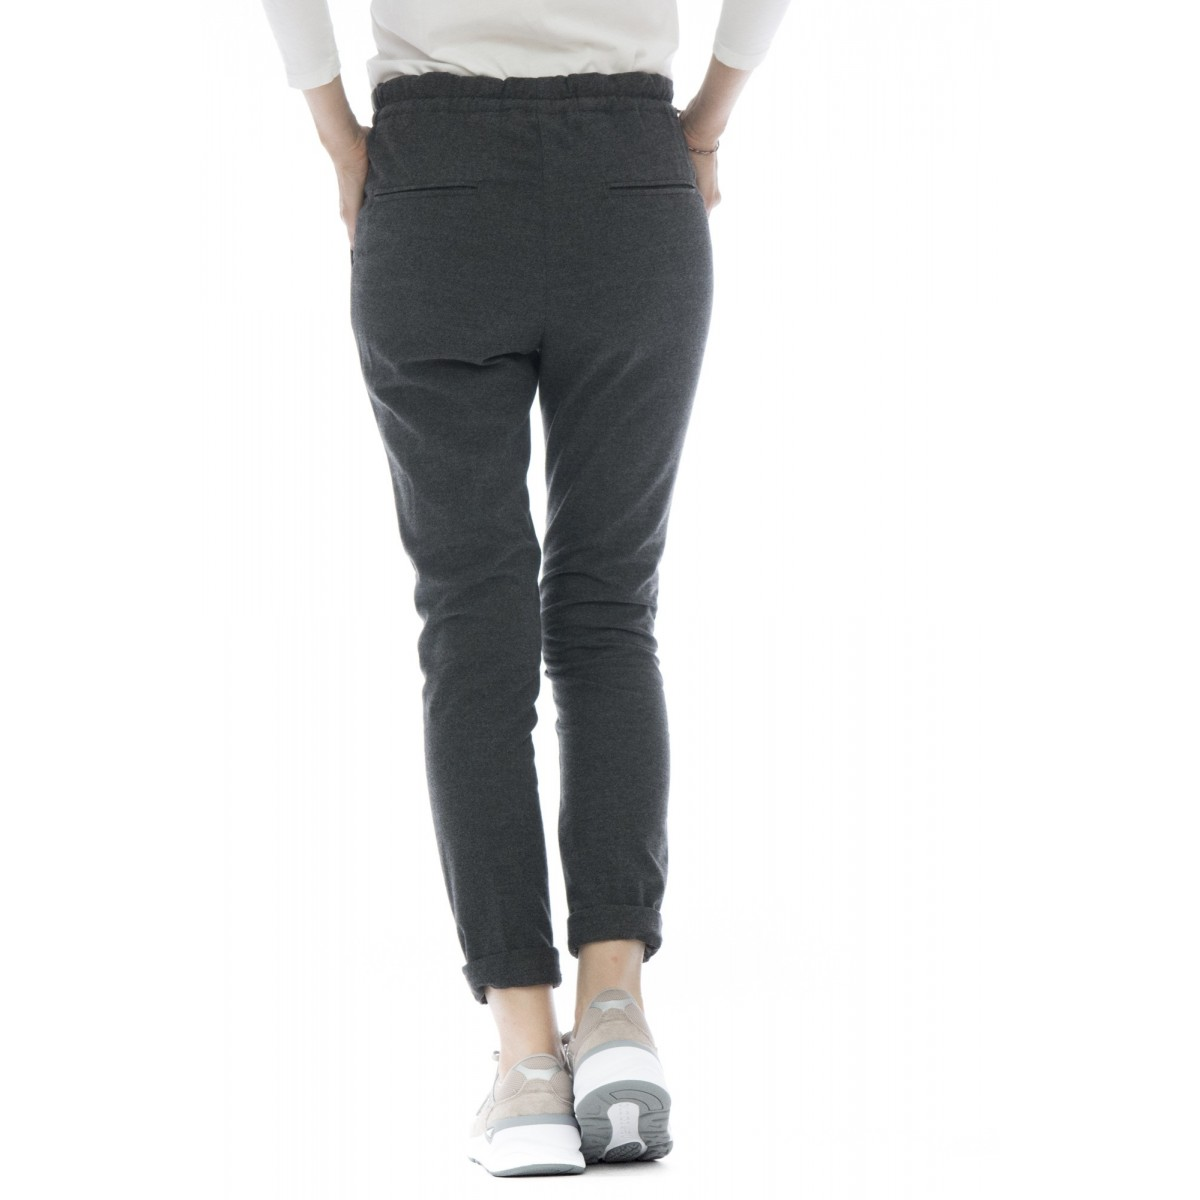 Pantalone donna - D04 pantalone coulisse panta jogging